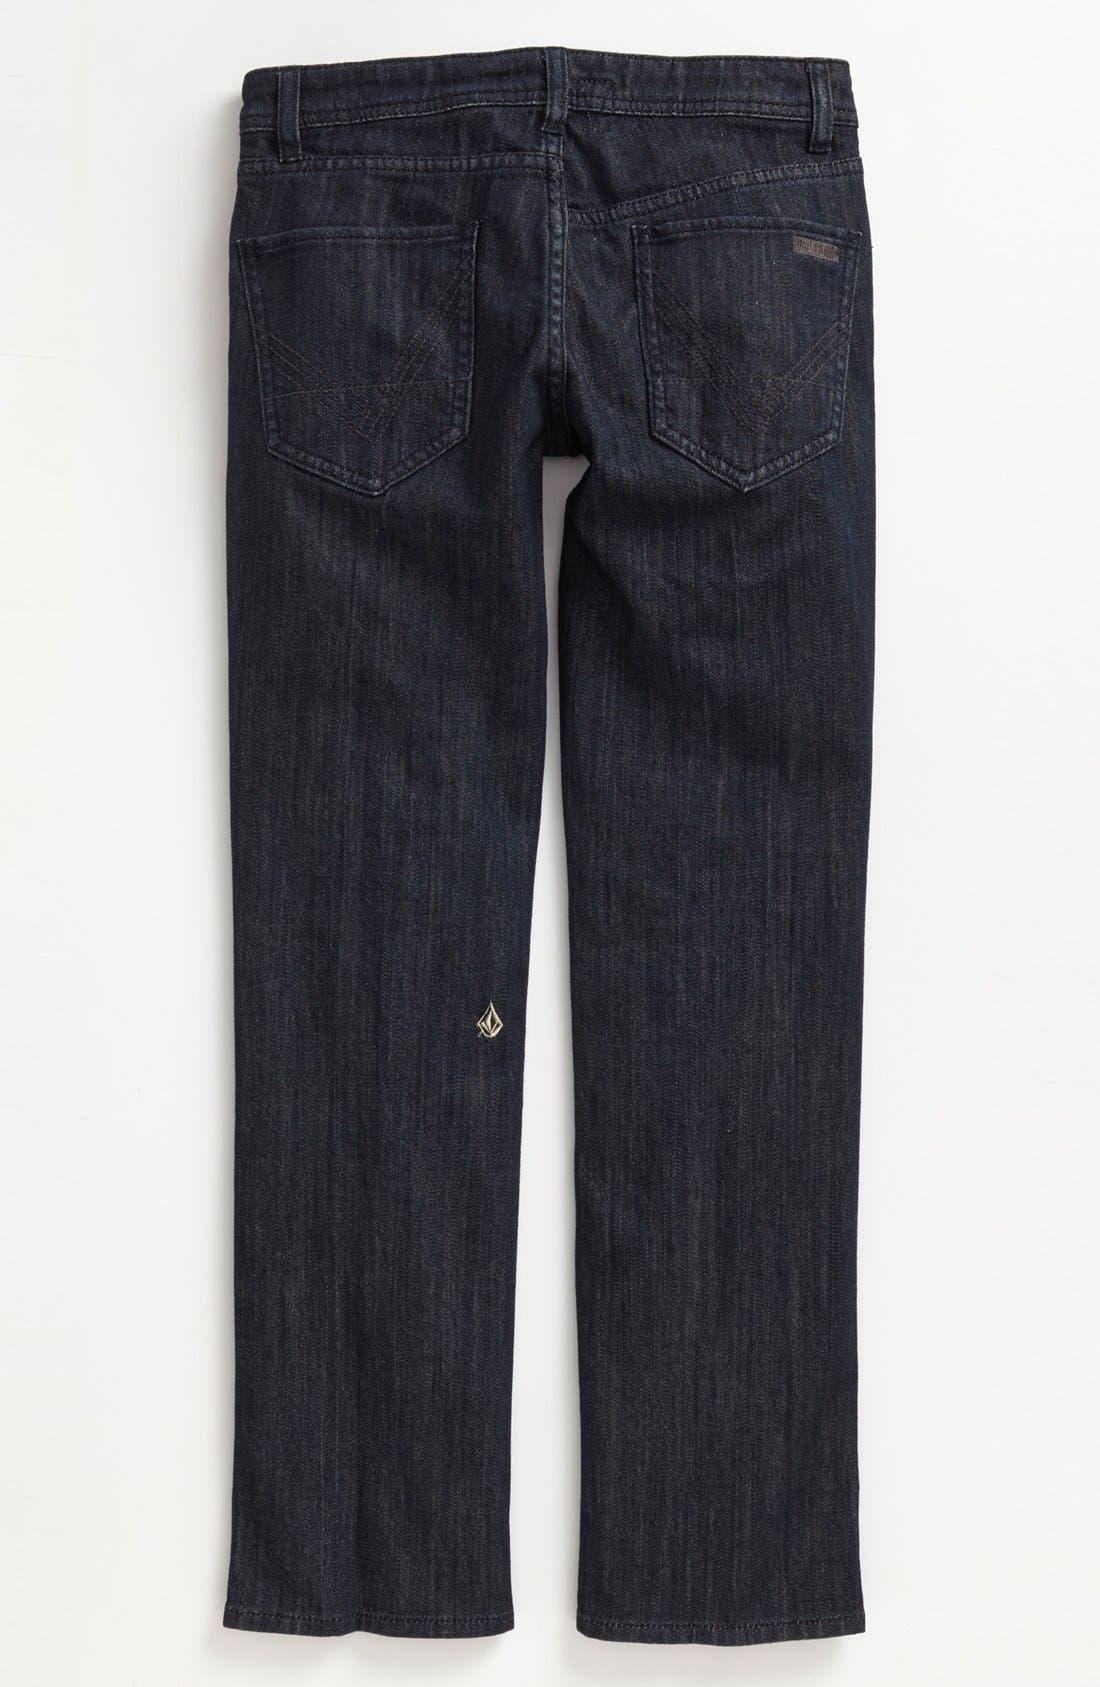 Main Image - Volcom 'Nova' Straight Leg Jeans (Big Boys)